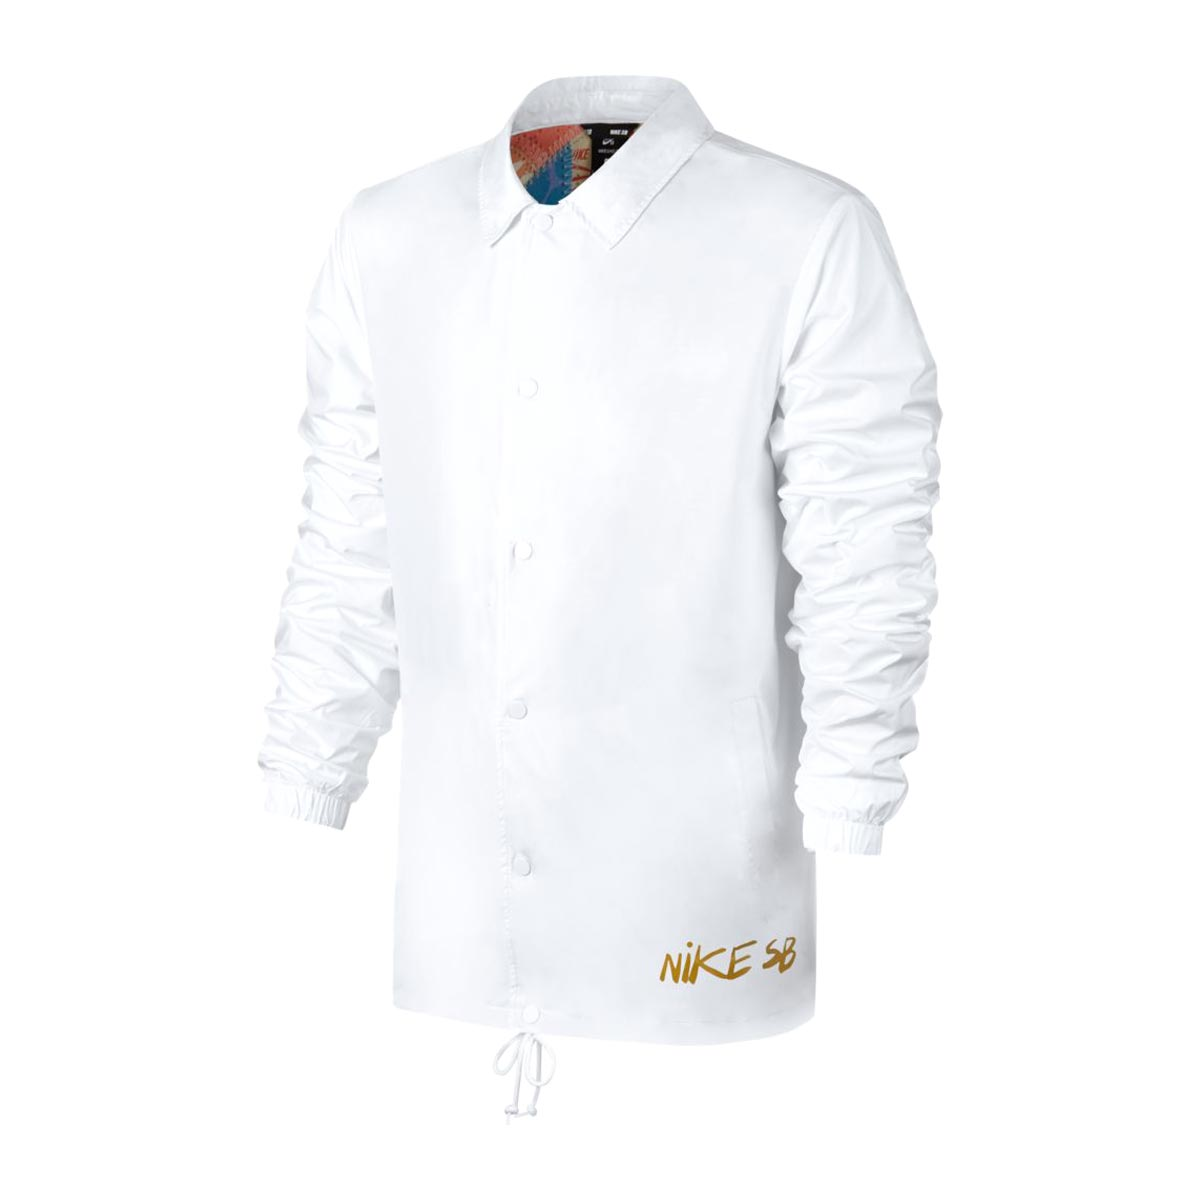 7762a74885f6 NIKE AS M NK SB SHLD JKT ICON QLT (WHITE (MINERAL GOLD)) (Nike SB SHIELD  icon kilt jacket)